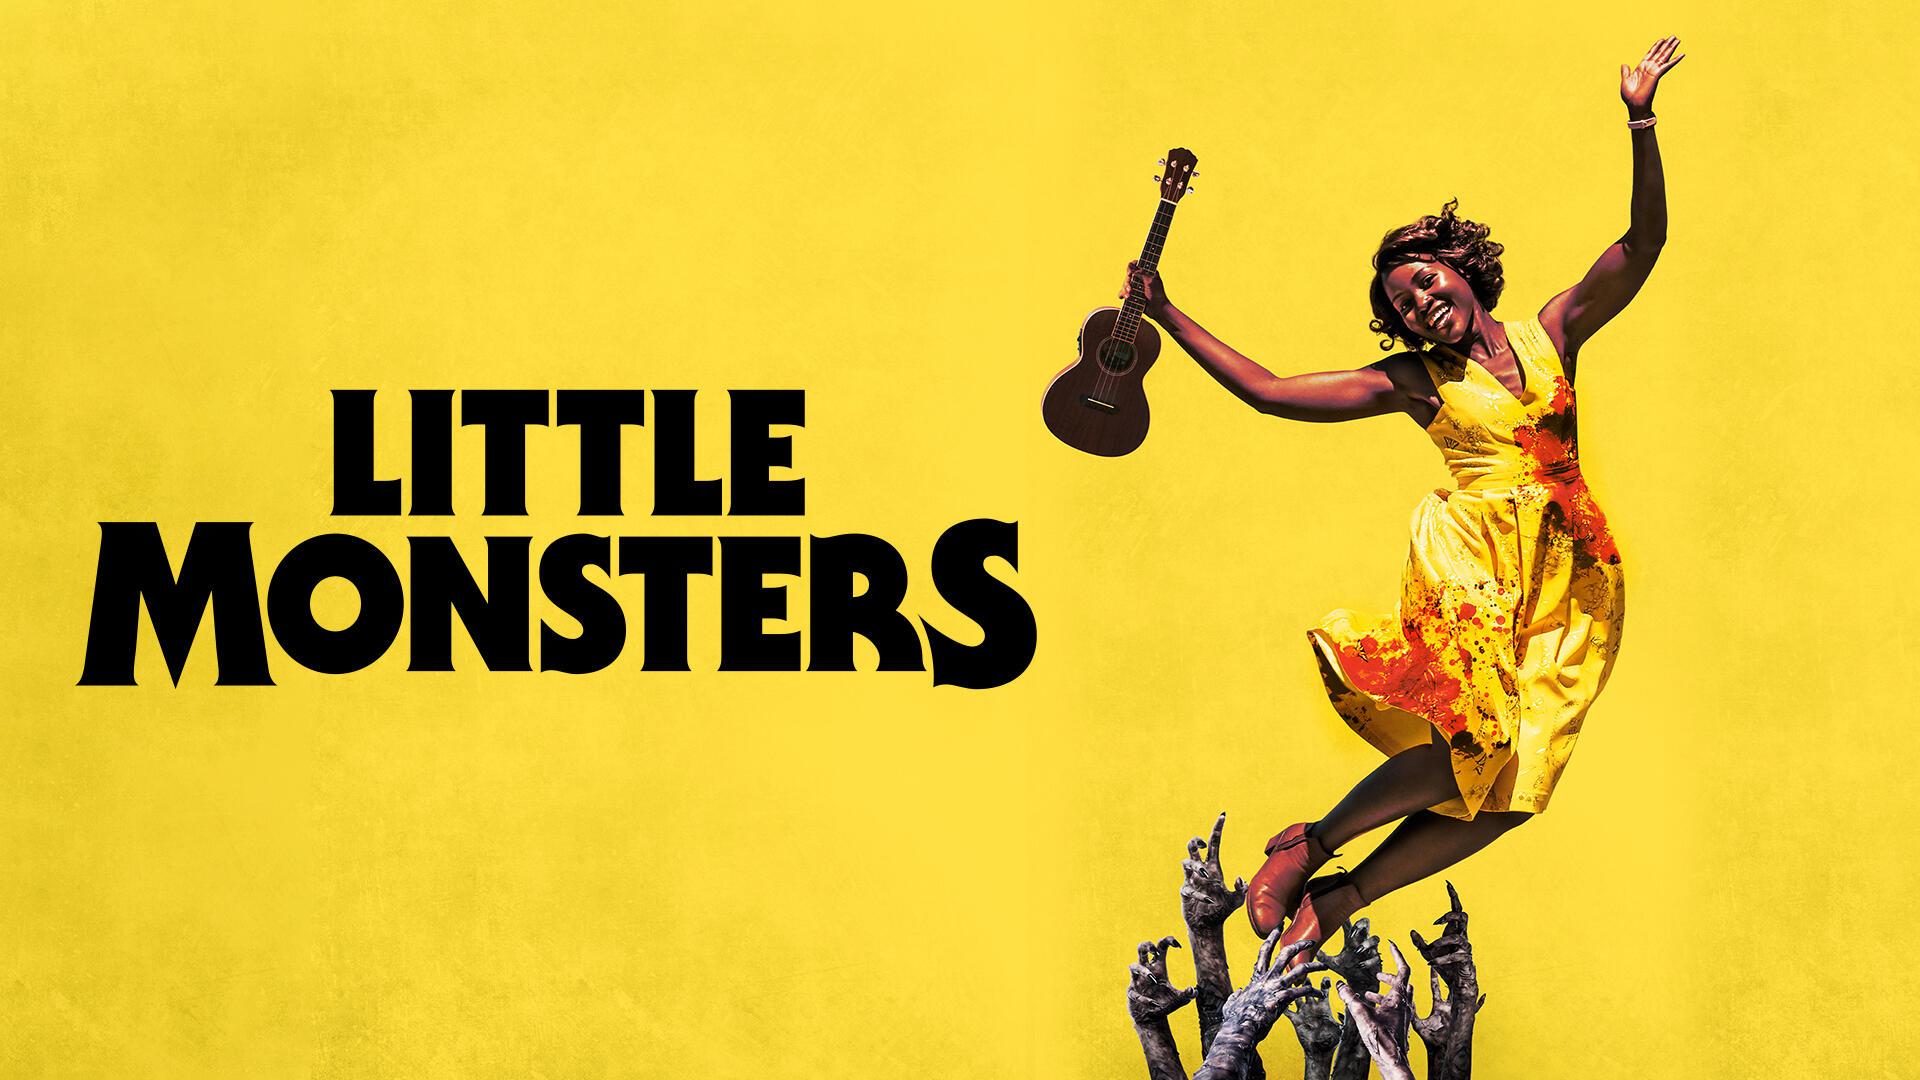 Little_Monsters_16x9